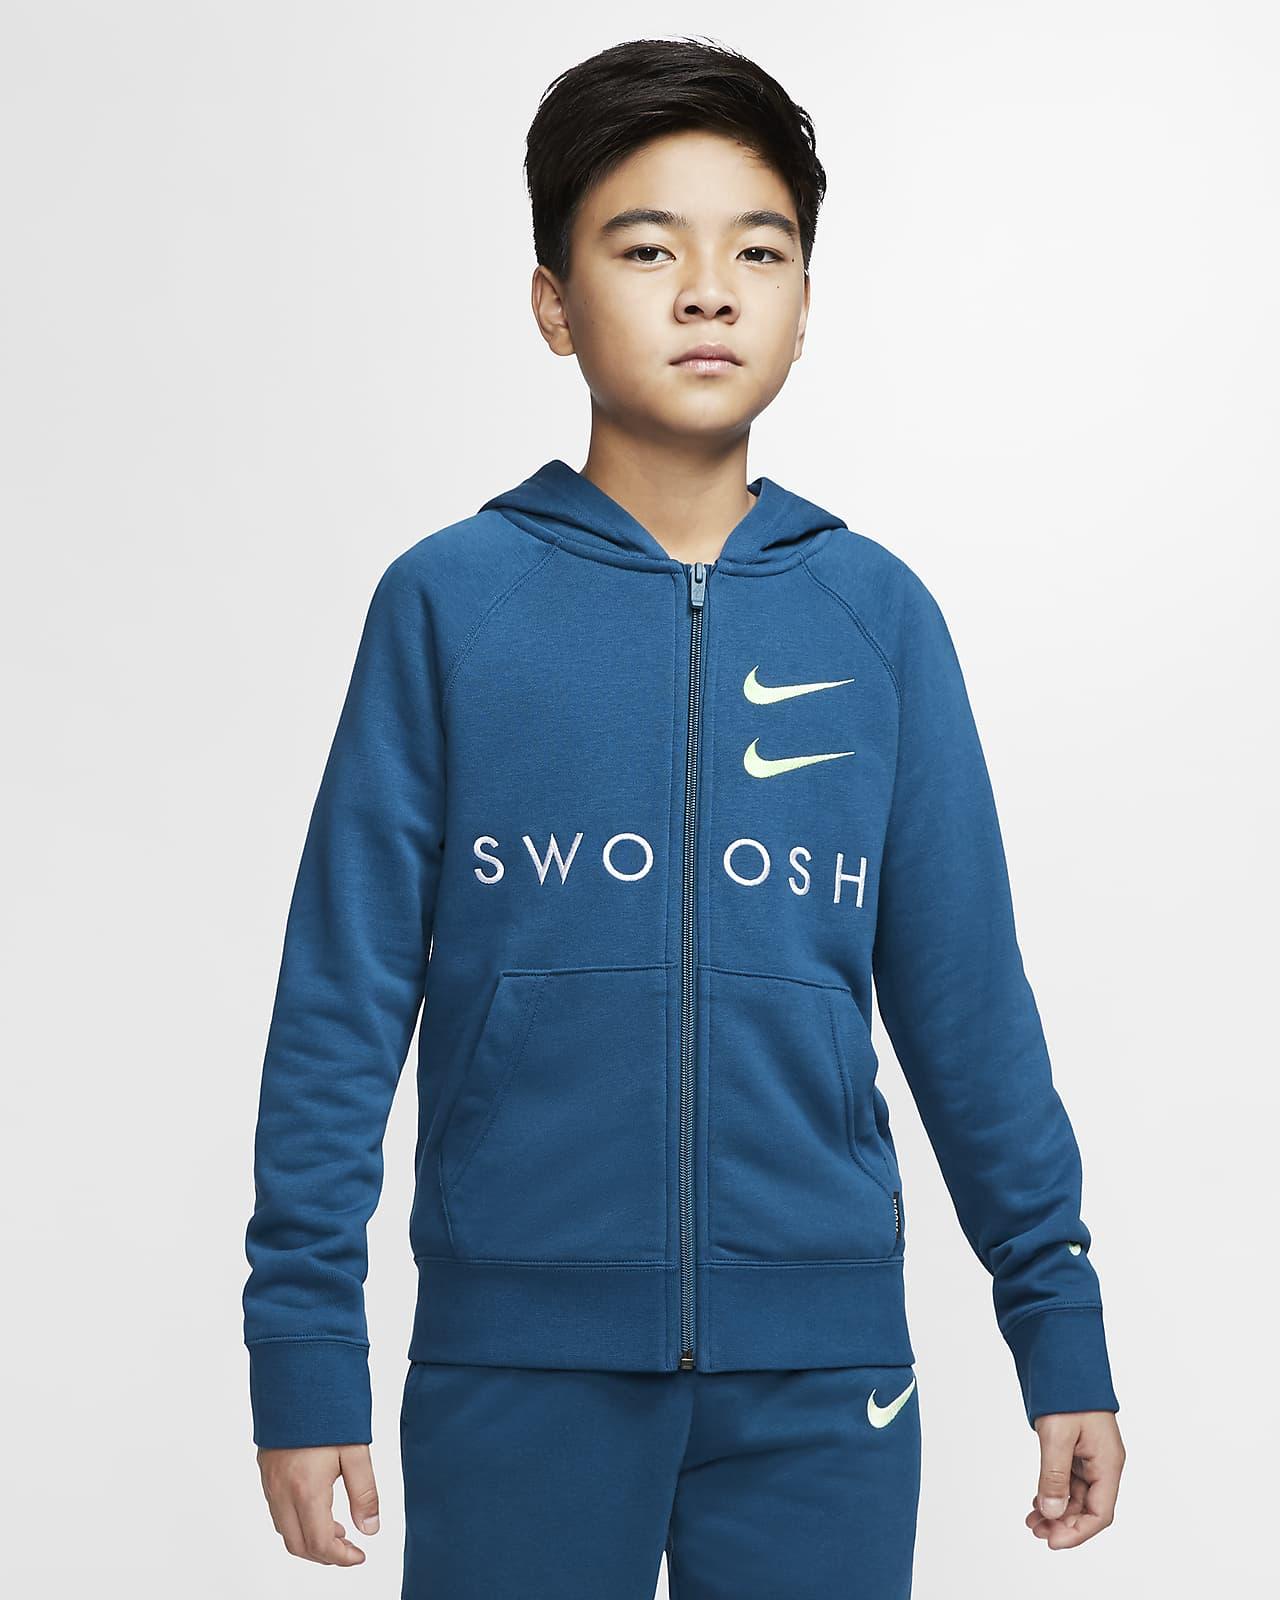 Nike Sportswear Swoosh Older Kids' (Boys') Full-Zip French Terry Hoodie